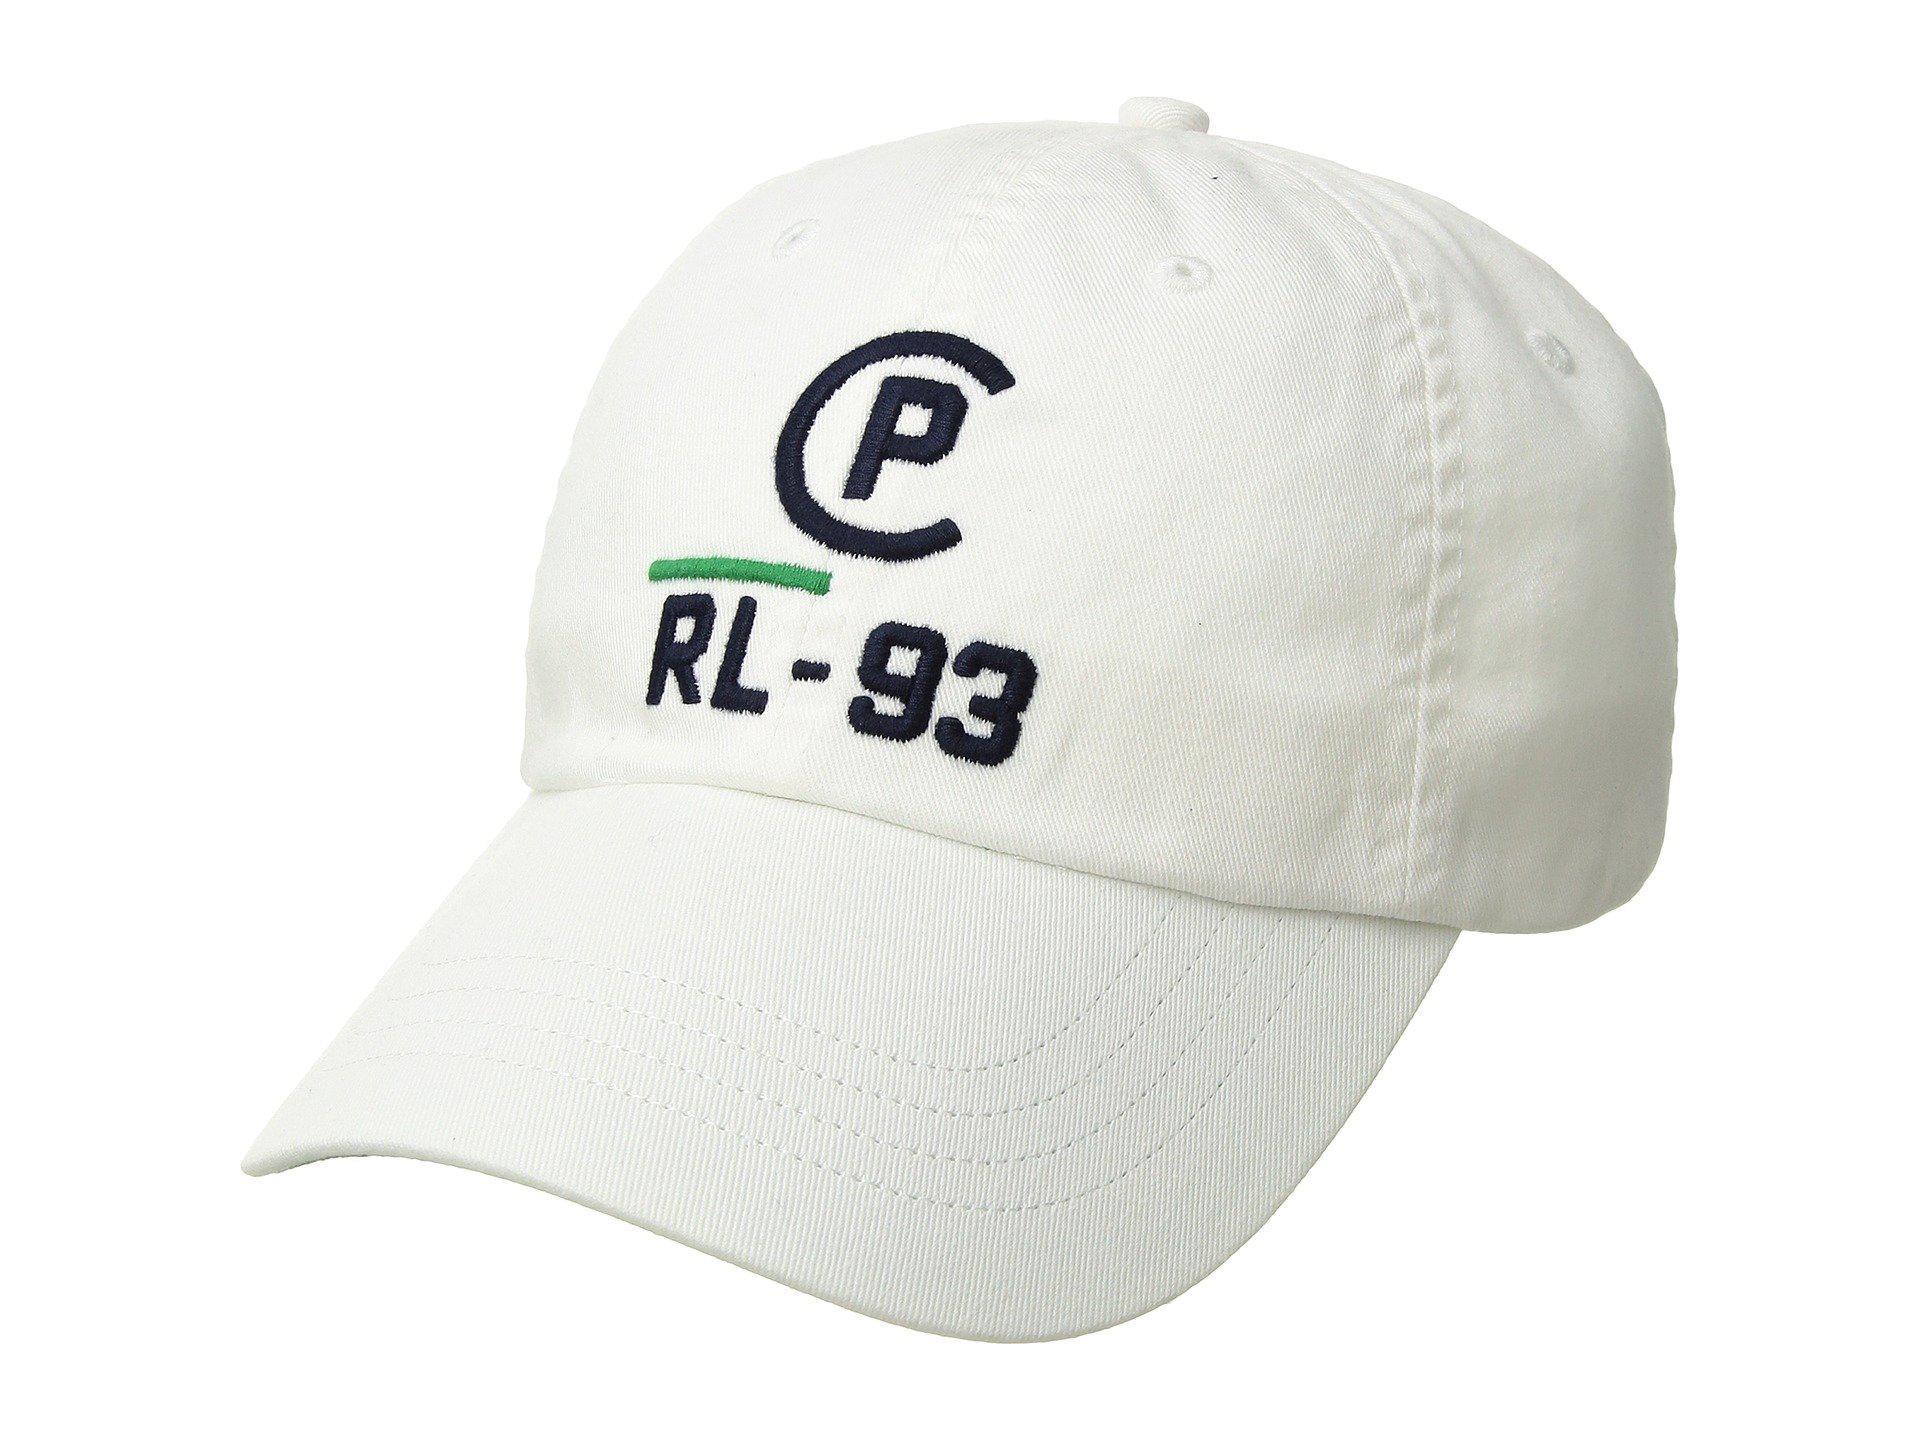 ec2bfc95095 Lyst - Polo Ralph Lauren Cp-93 Cotton Chino Classic Sport Cap (white ...